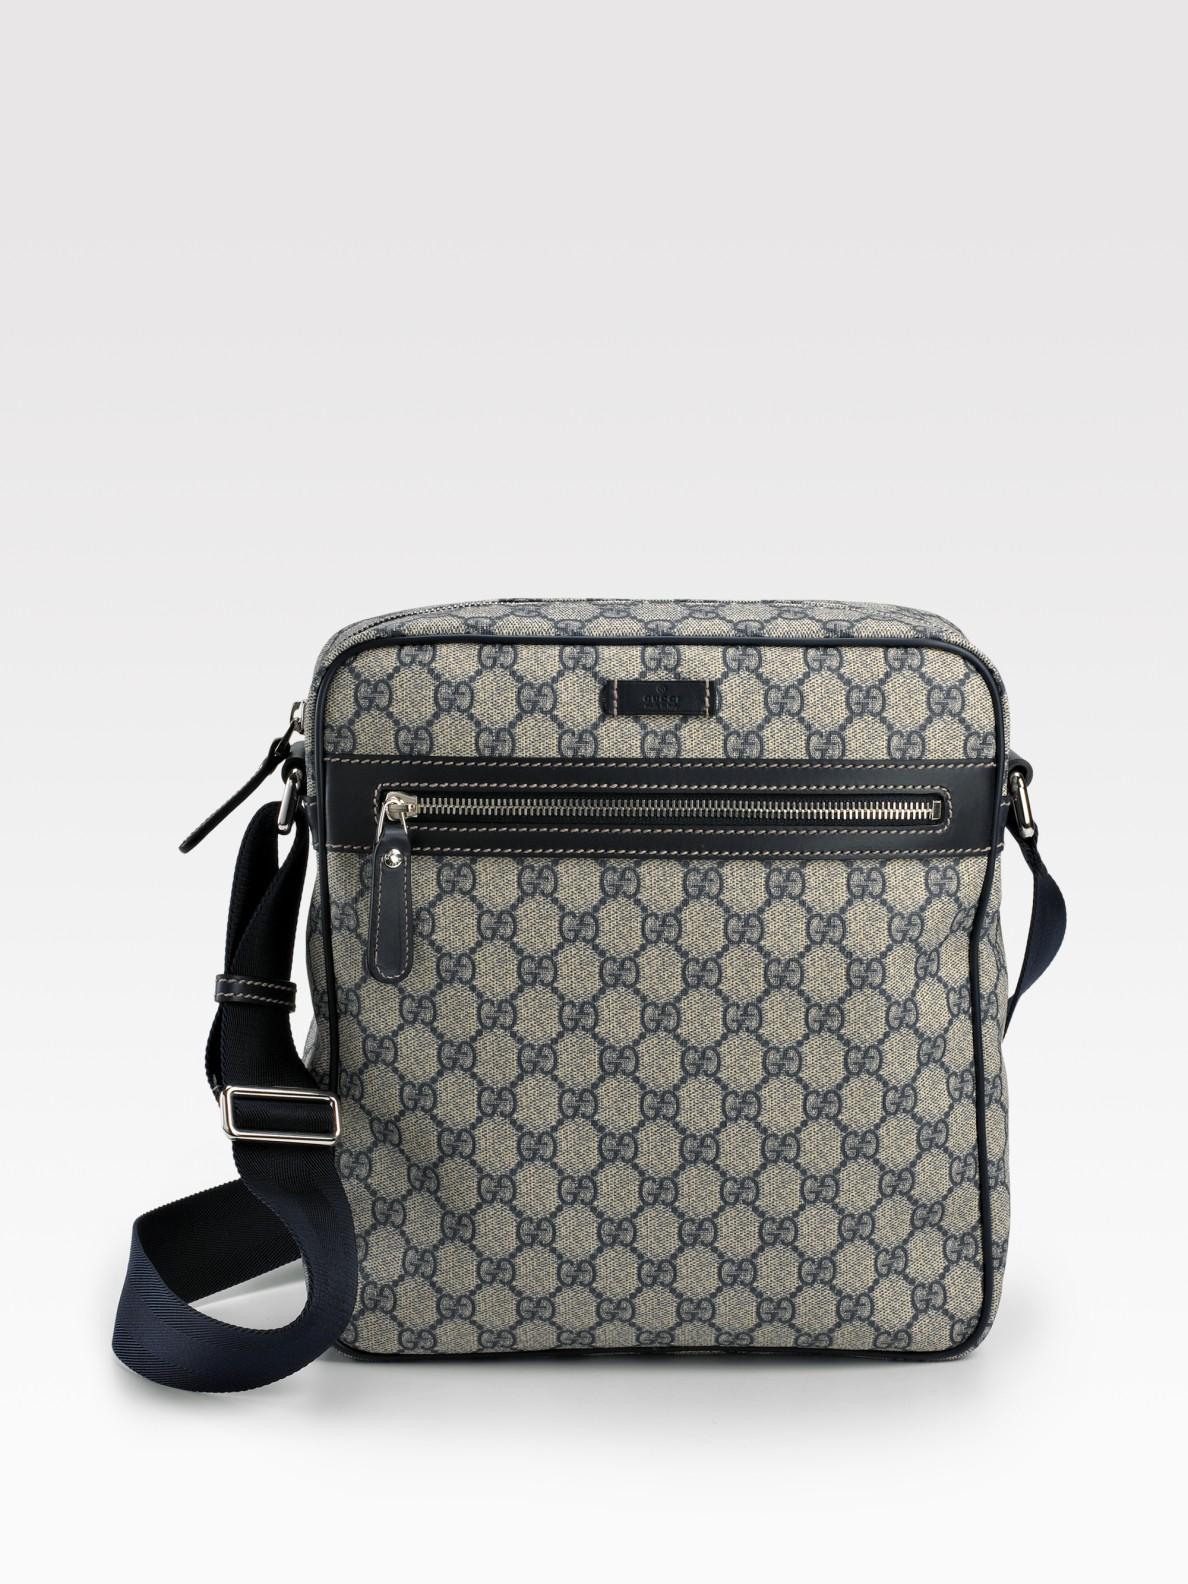 98c052daacf Lyst - Gucci Messenger Bag in Natural for Men